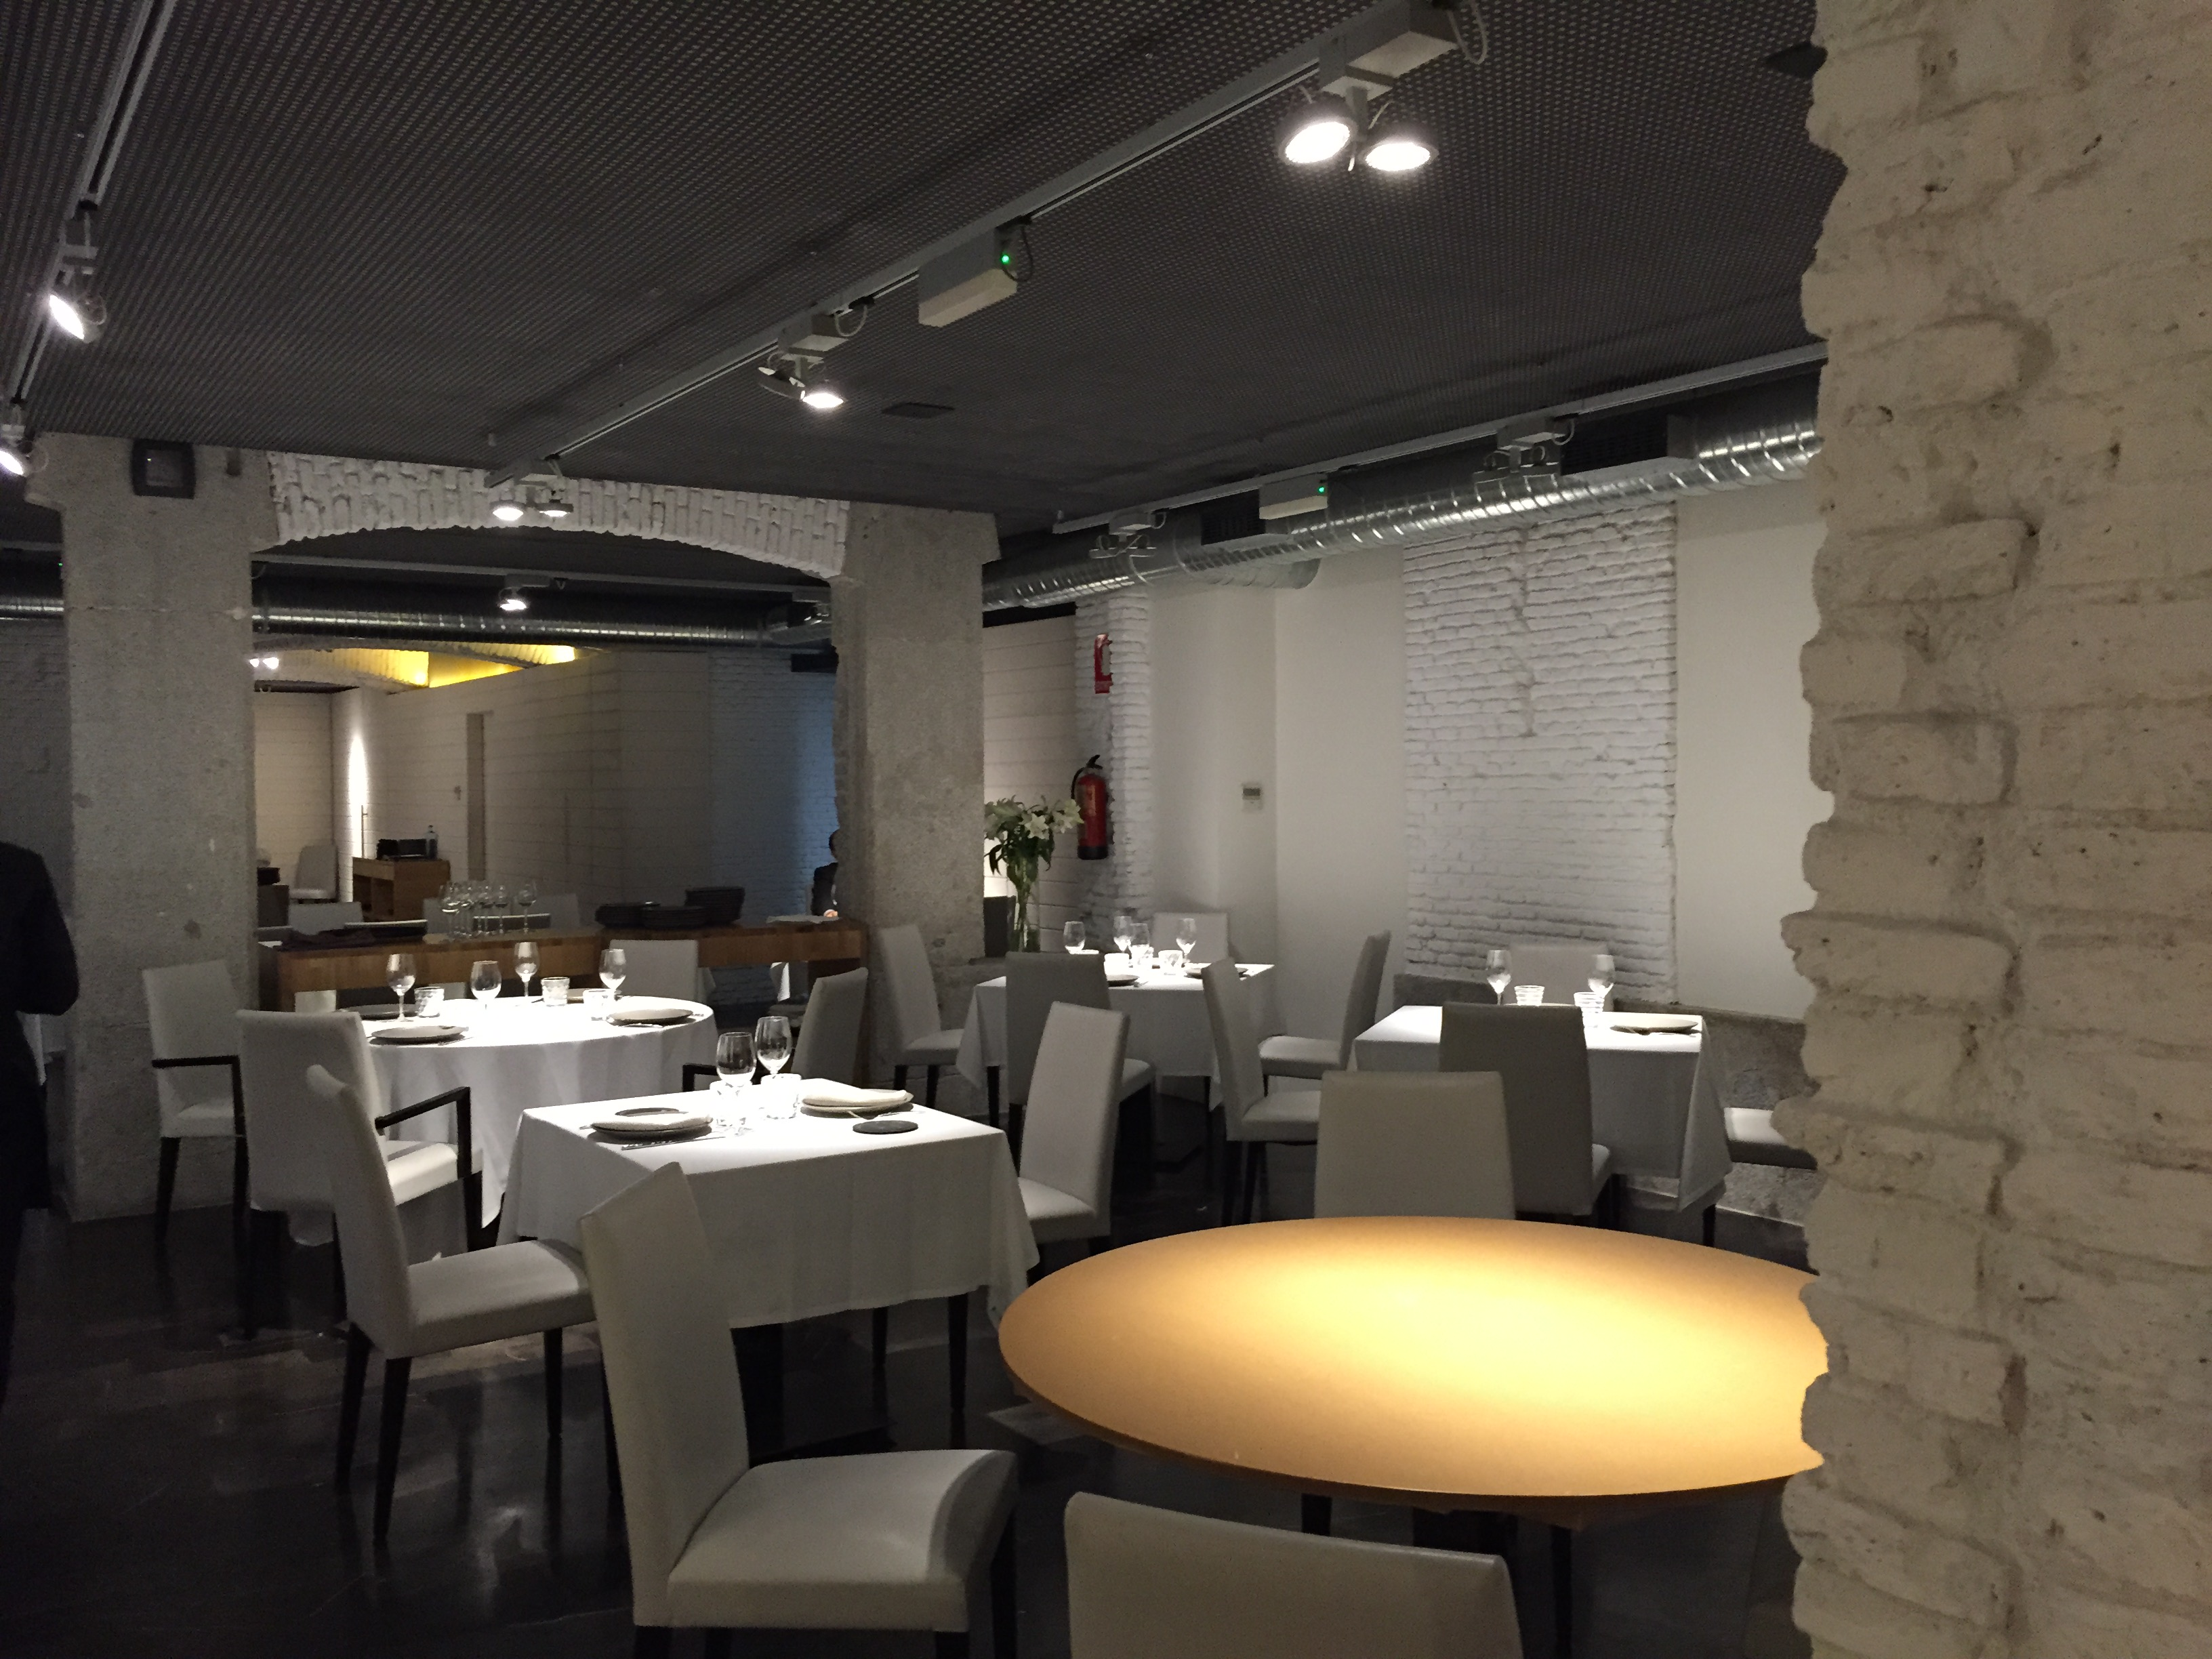 Alabaster dime un restaurante - Restaurante singapur valencia ...